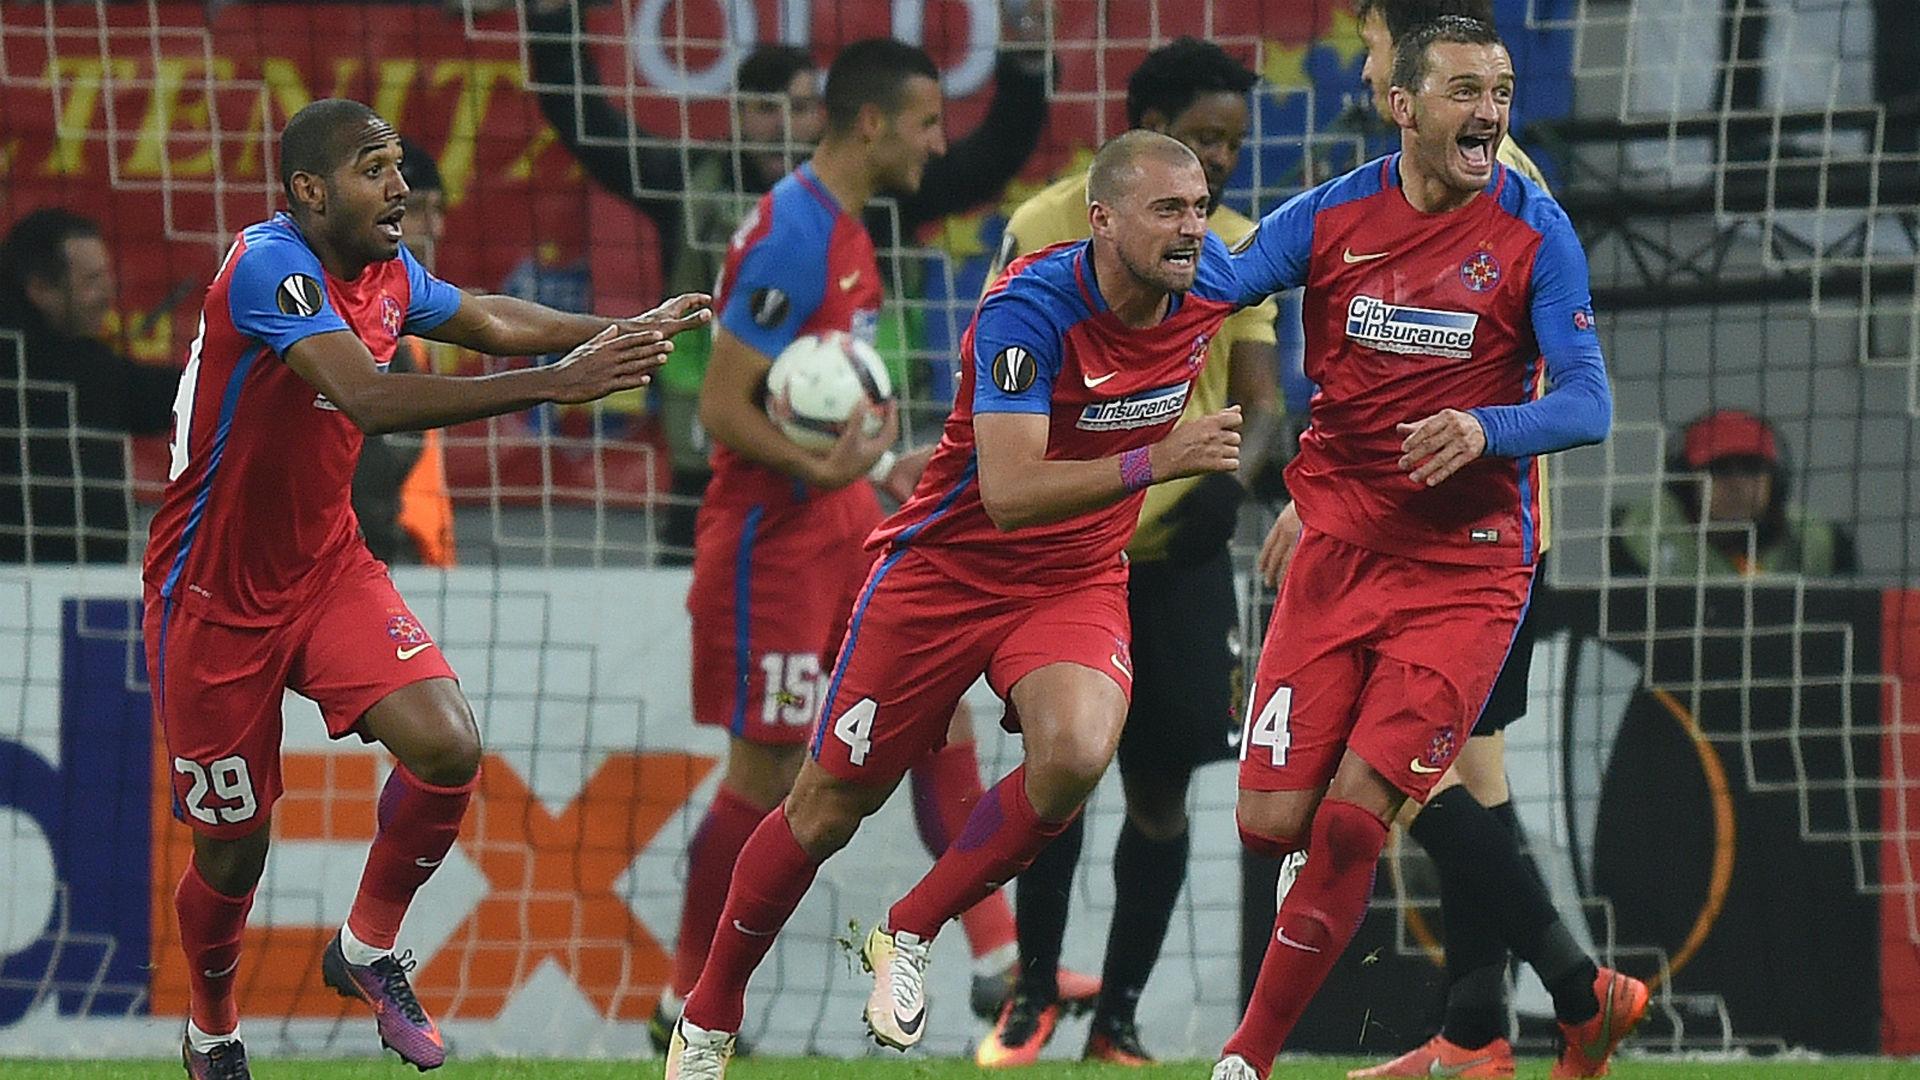 FCSB Steaua Bucharest